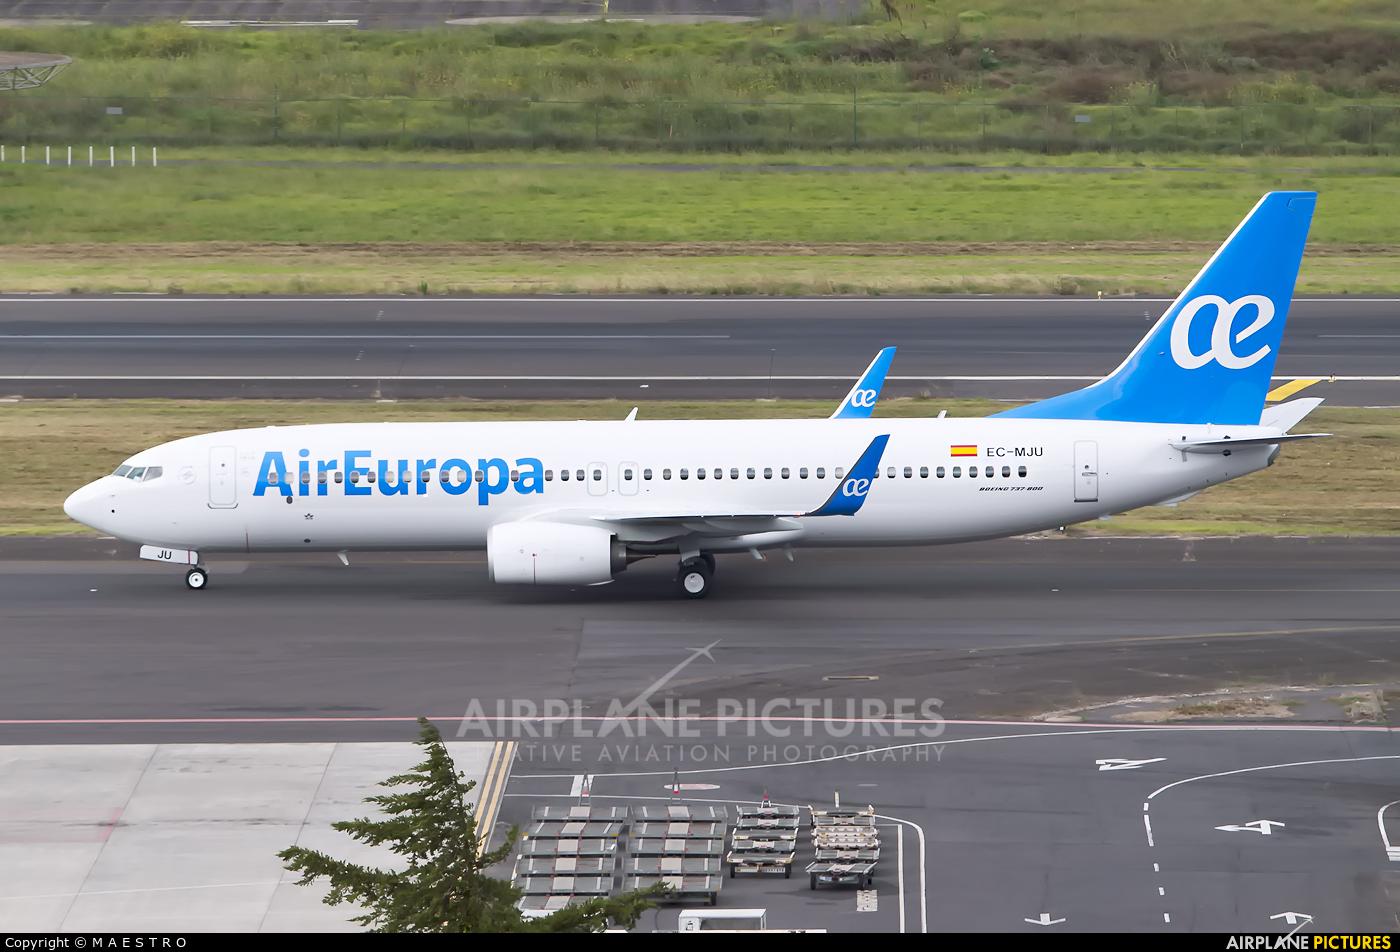 Air Europa EC-MJU aircraft at Tenerife Norte - Los Rodeos